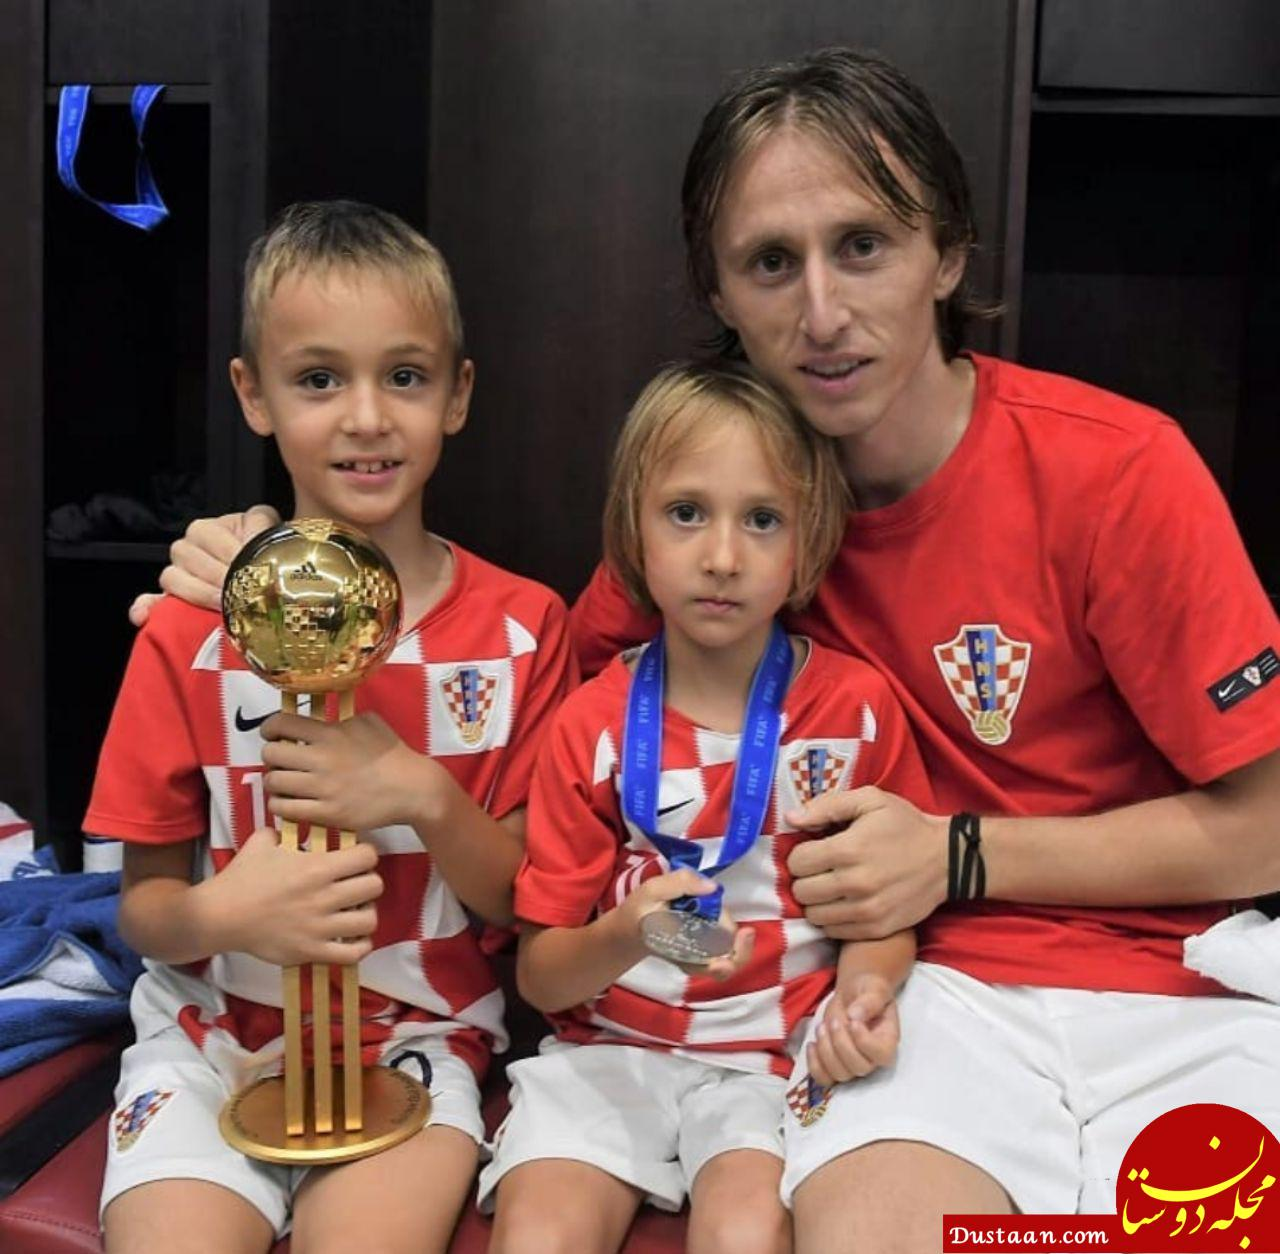 www.dustaan.com واکنش بهترین بازیکن جام جهانی به برانکو!